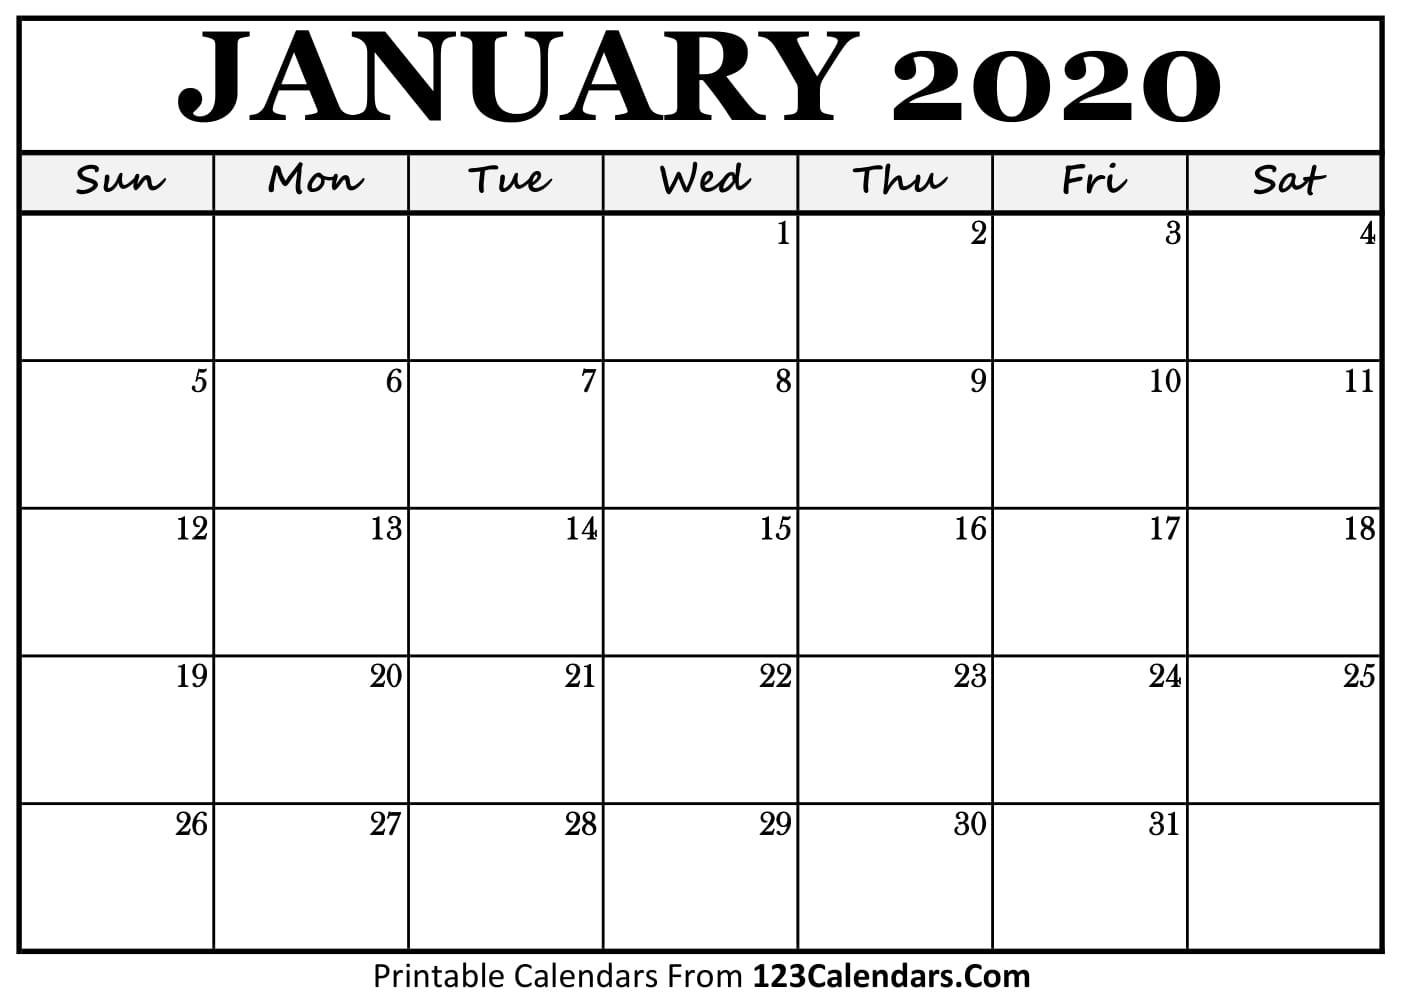 Free Printable Calendar | 123Calendars  Blank Calendar 2020 Printable Monthly